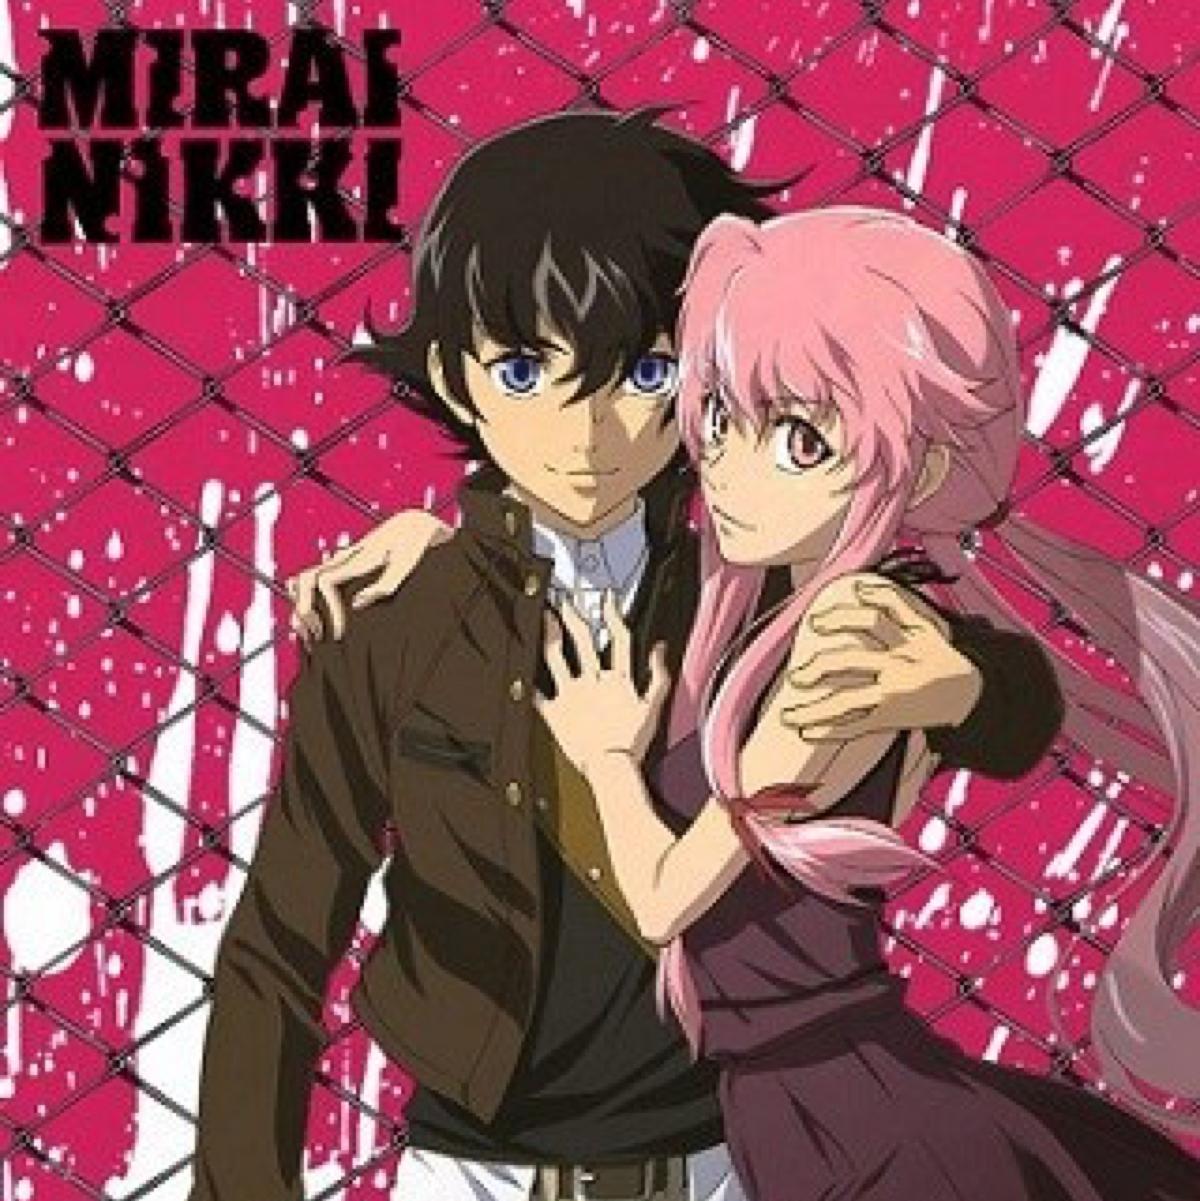 mirai nikki: personajes